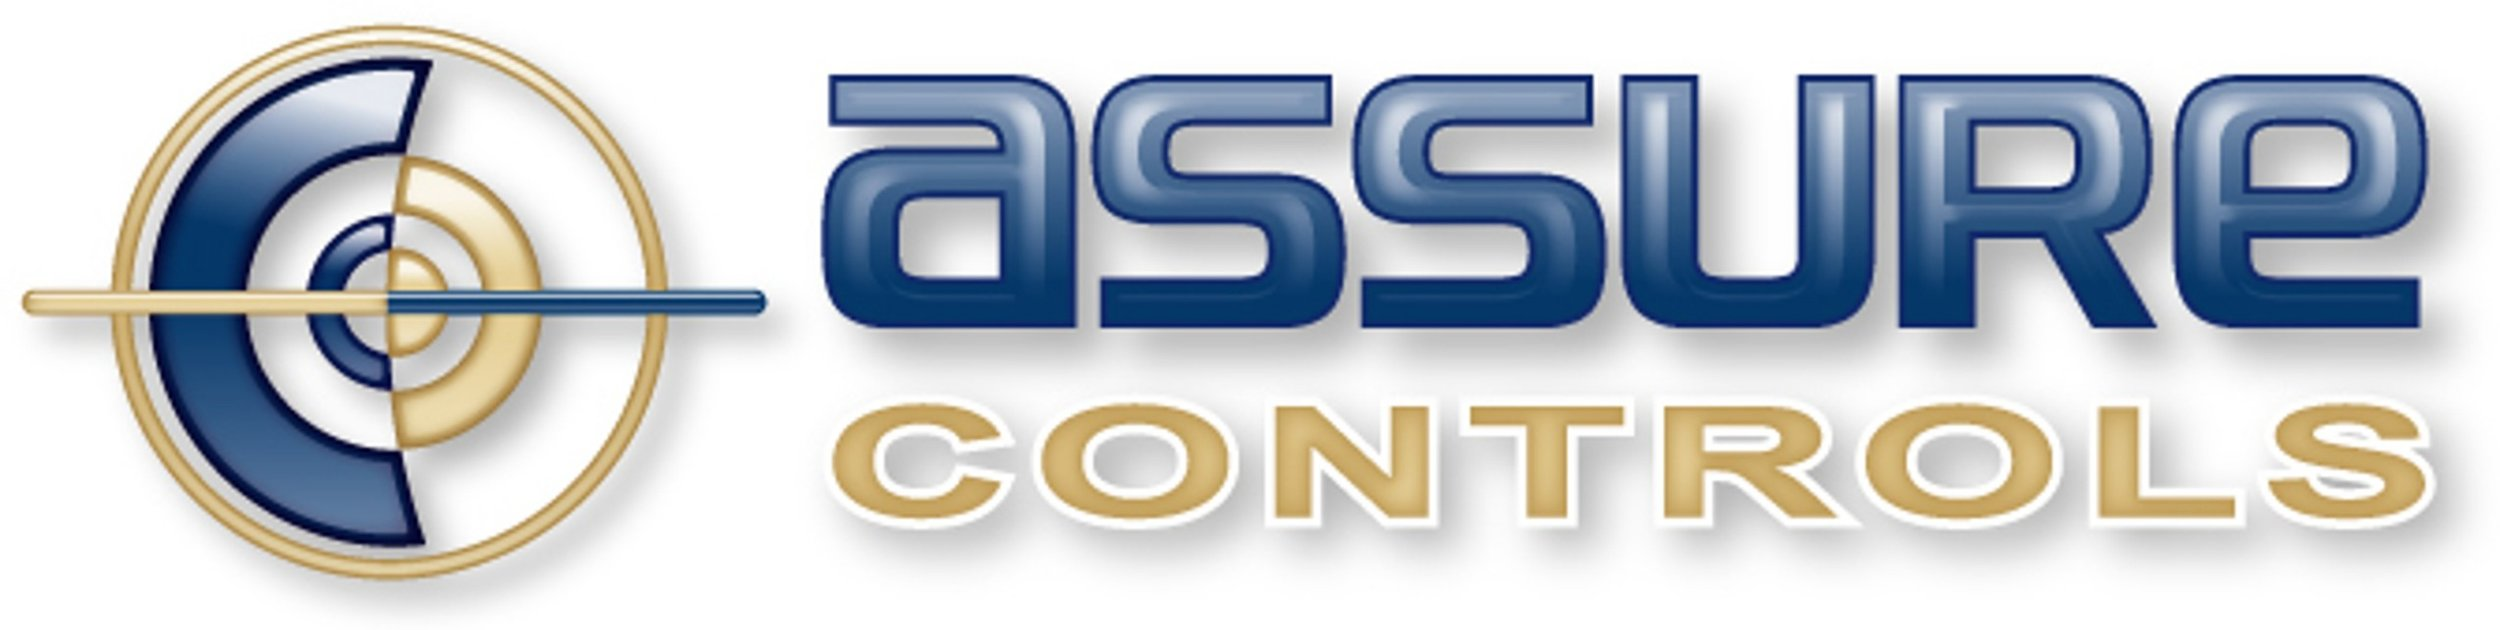 Assure Logo-clear-large.jpg